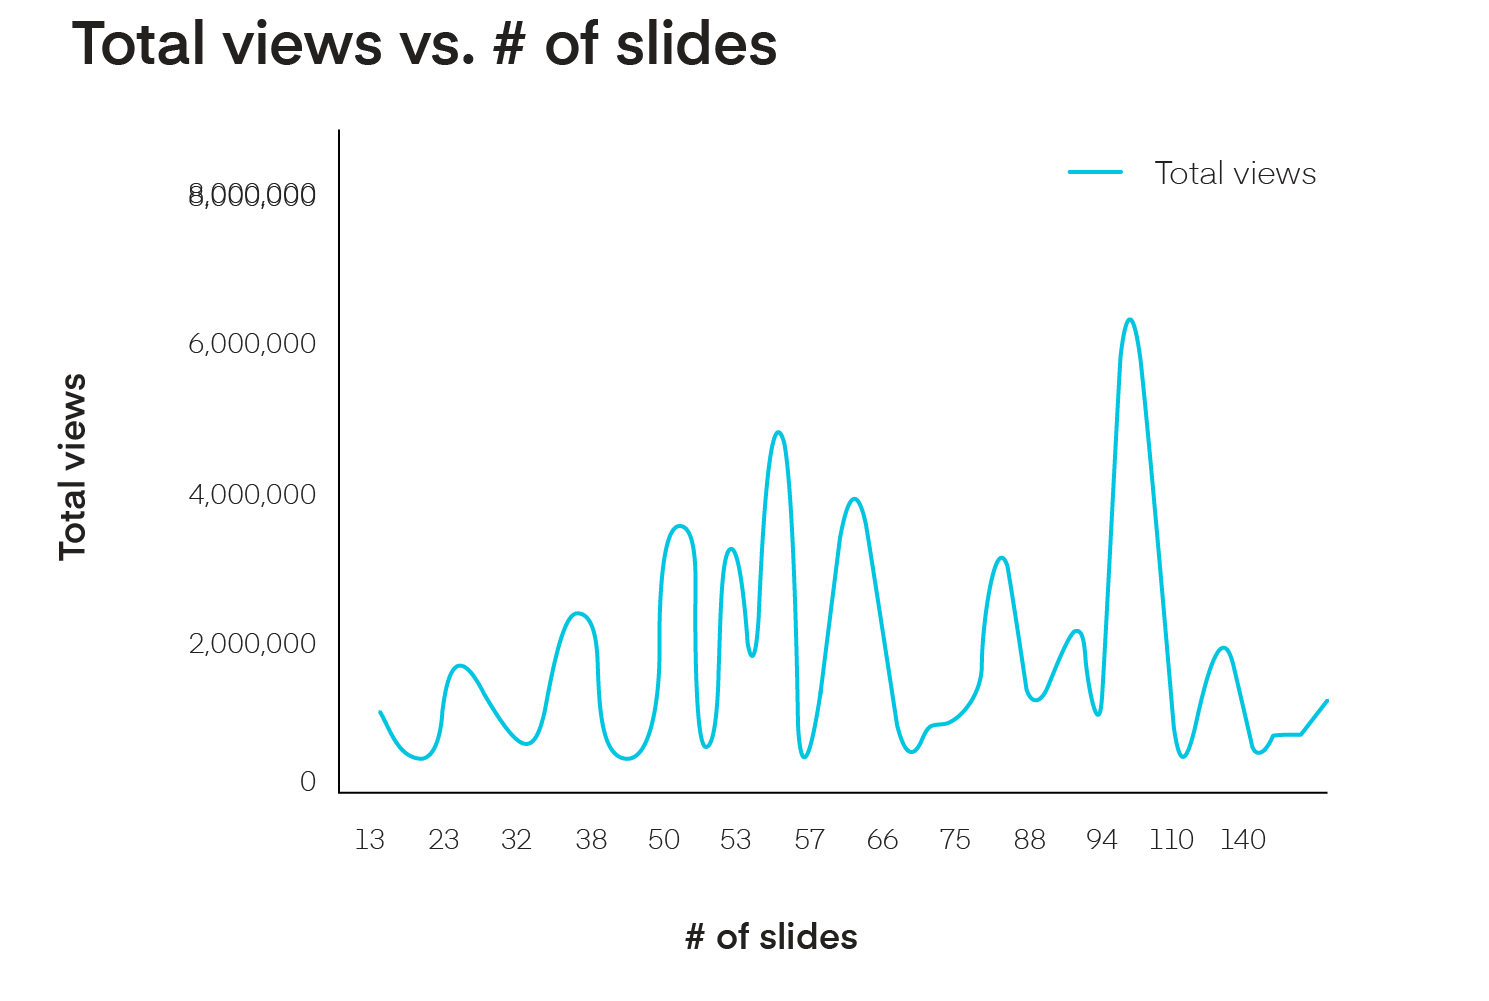 Average number of slides vs views